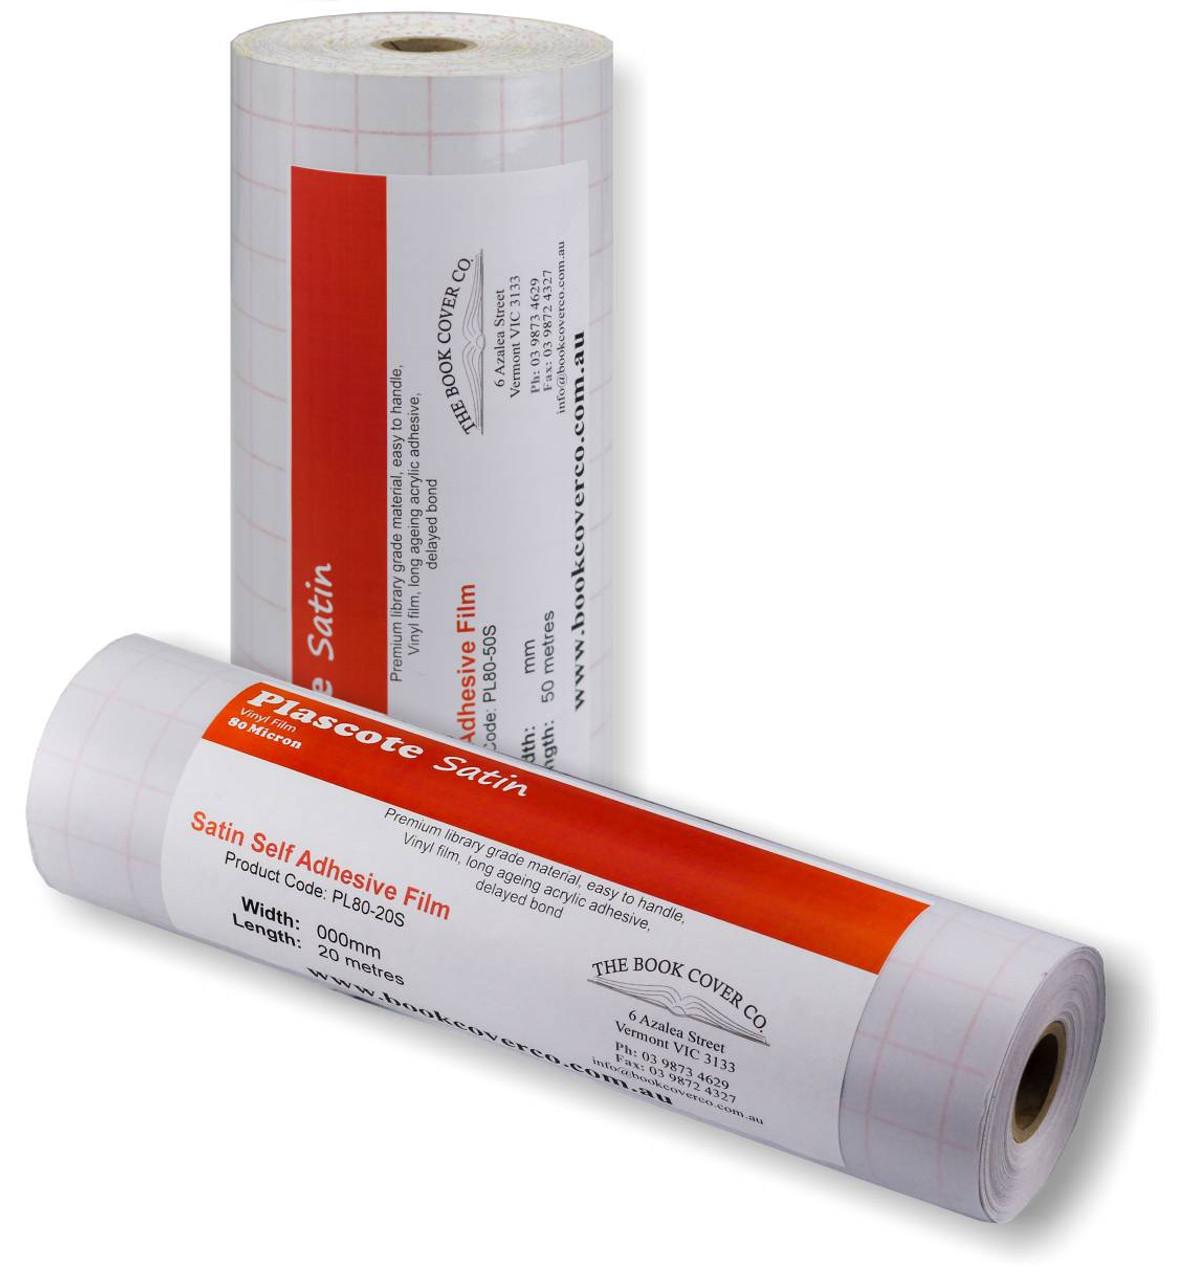 Plascote Self Adhesive - 80 micron Satin